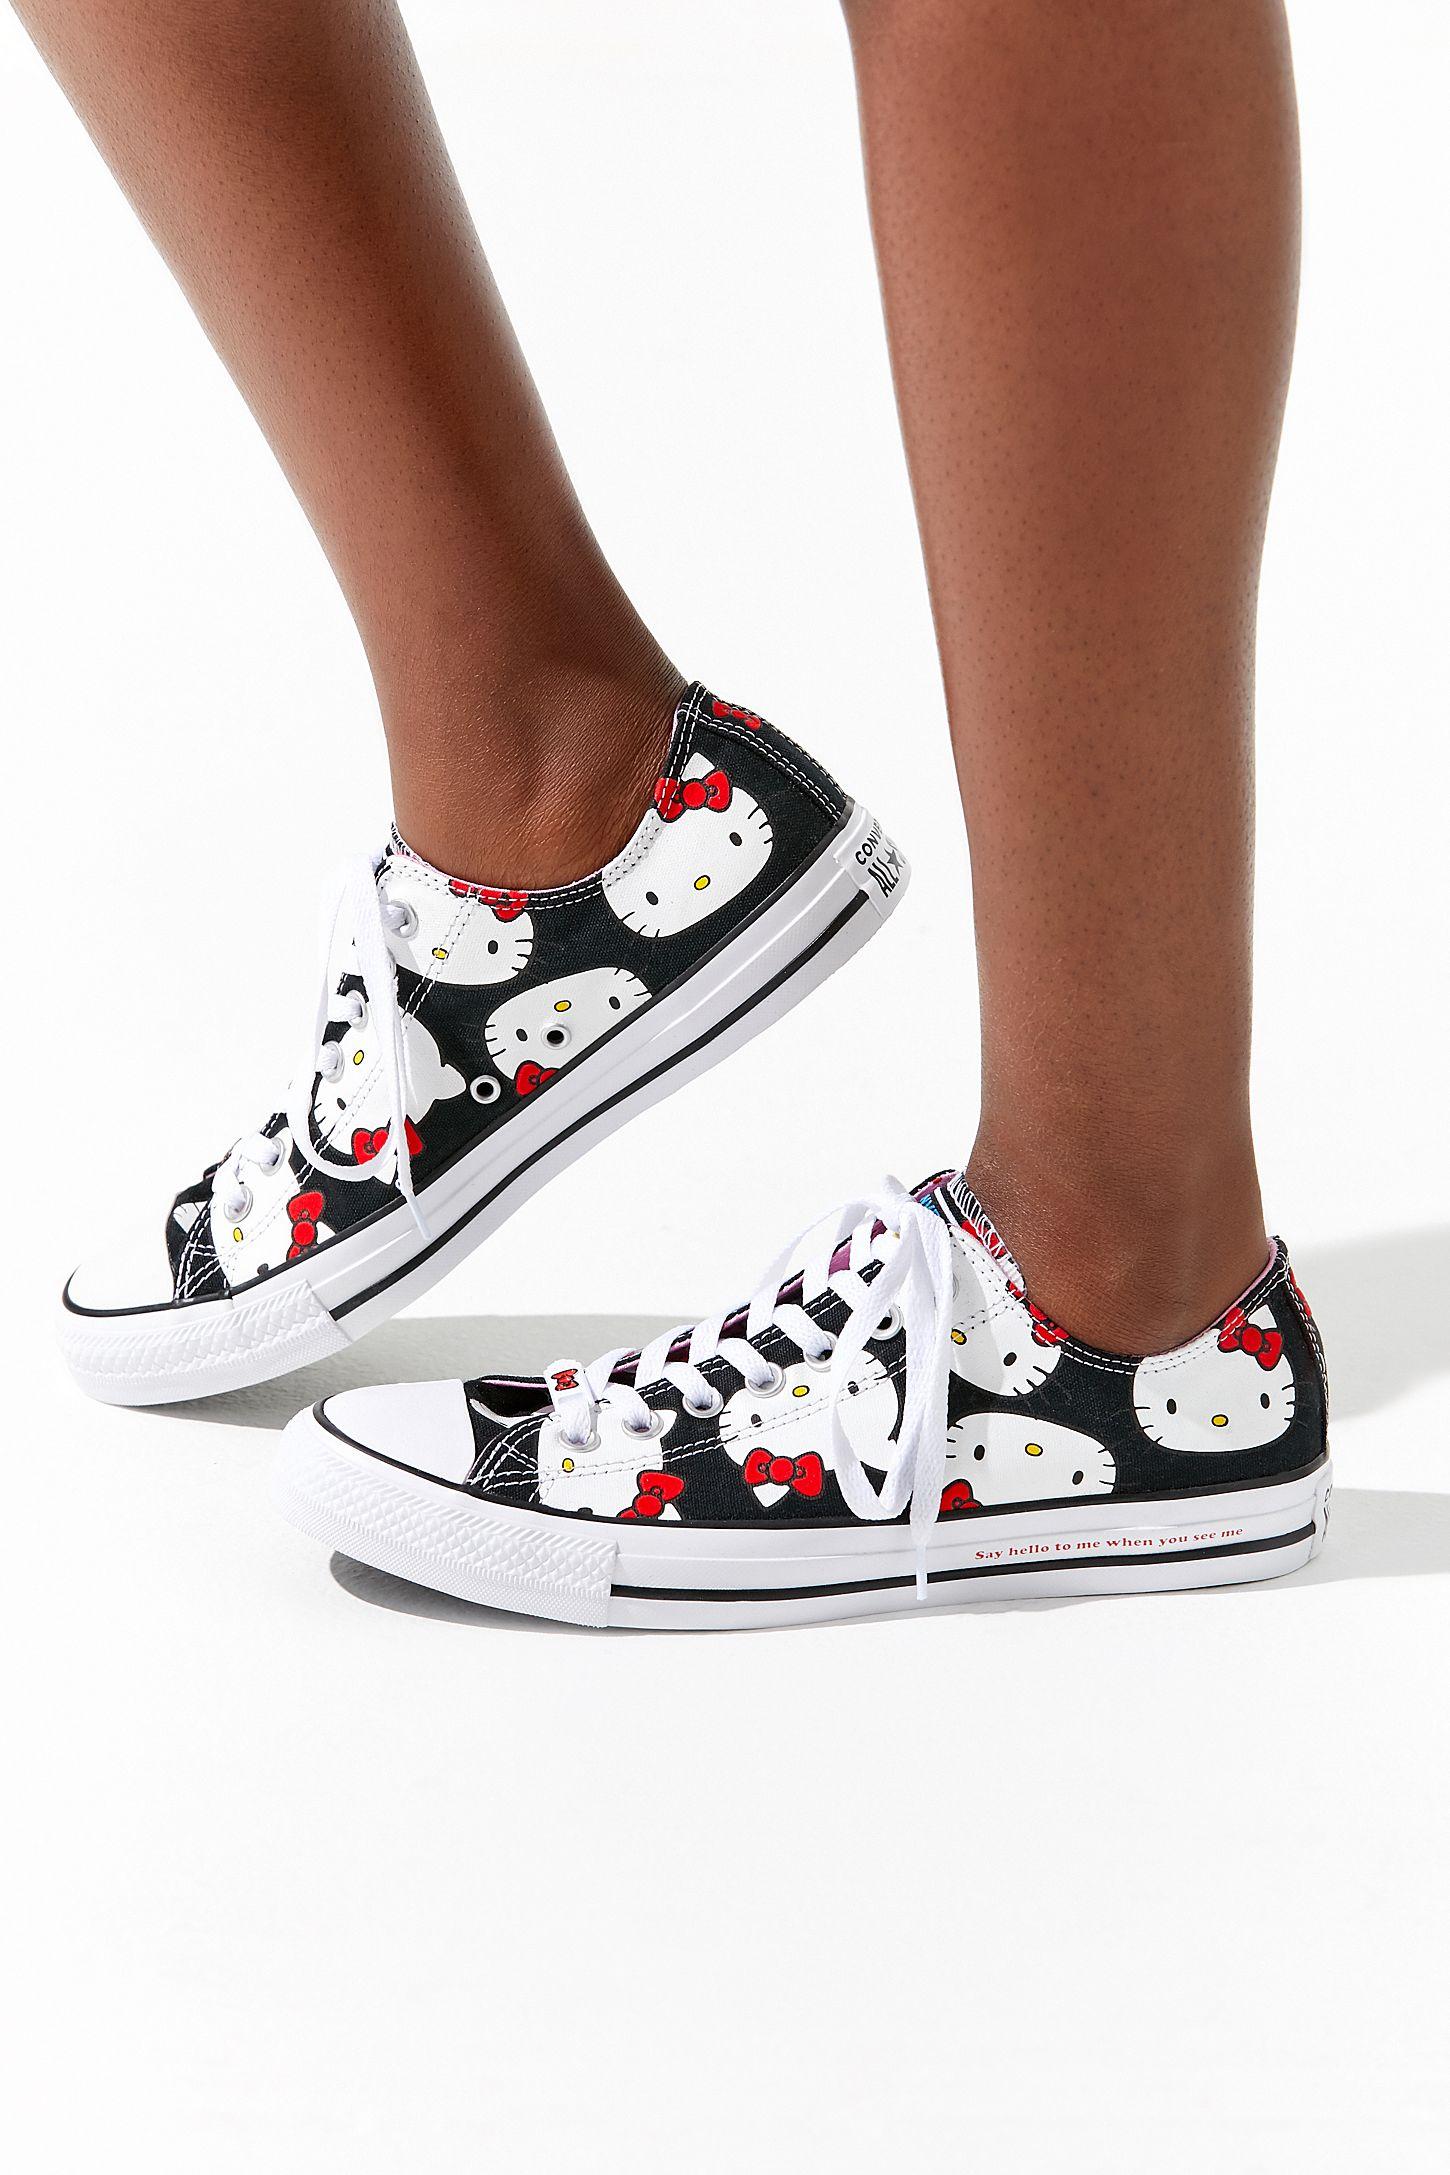 dd70c93edae5c3 Converse X Hello Kitty Chuck Taylor All Star Low Top Sneaker